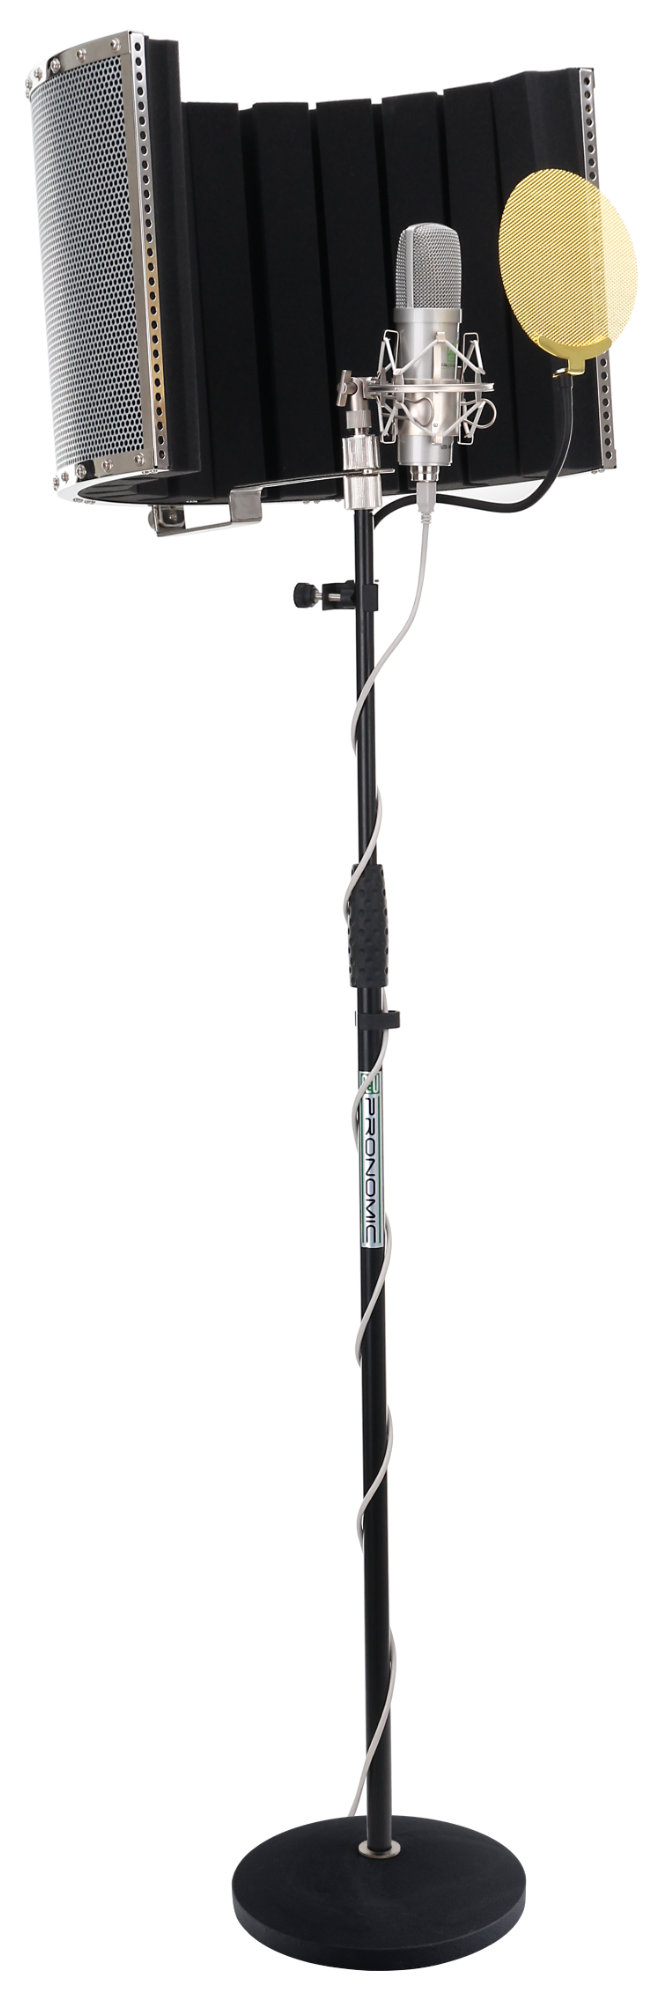 Mikrofone - Pronomic USB M910 Kondensator Mikrofon Komplettset inkl. Stativ, Popschutz gold Micscreen - Onlineshop Musikhaus Kirstein